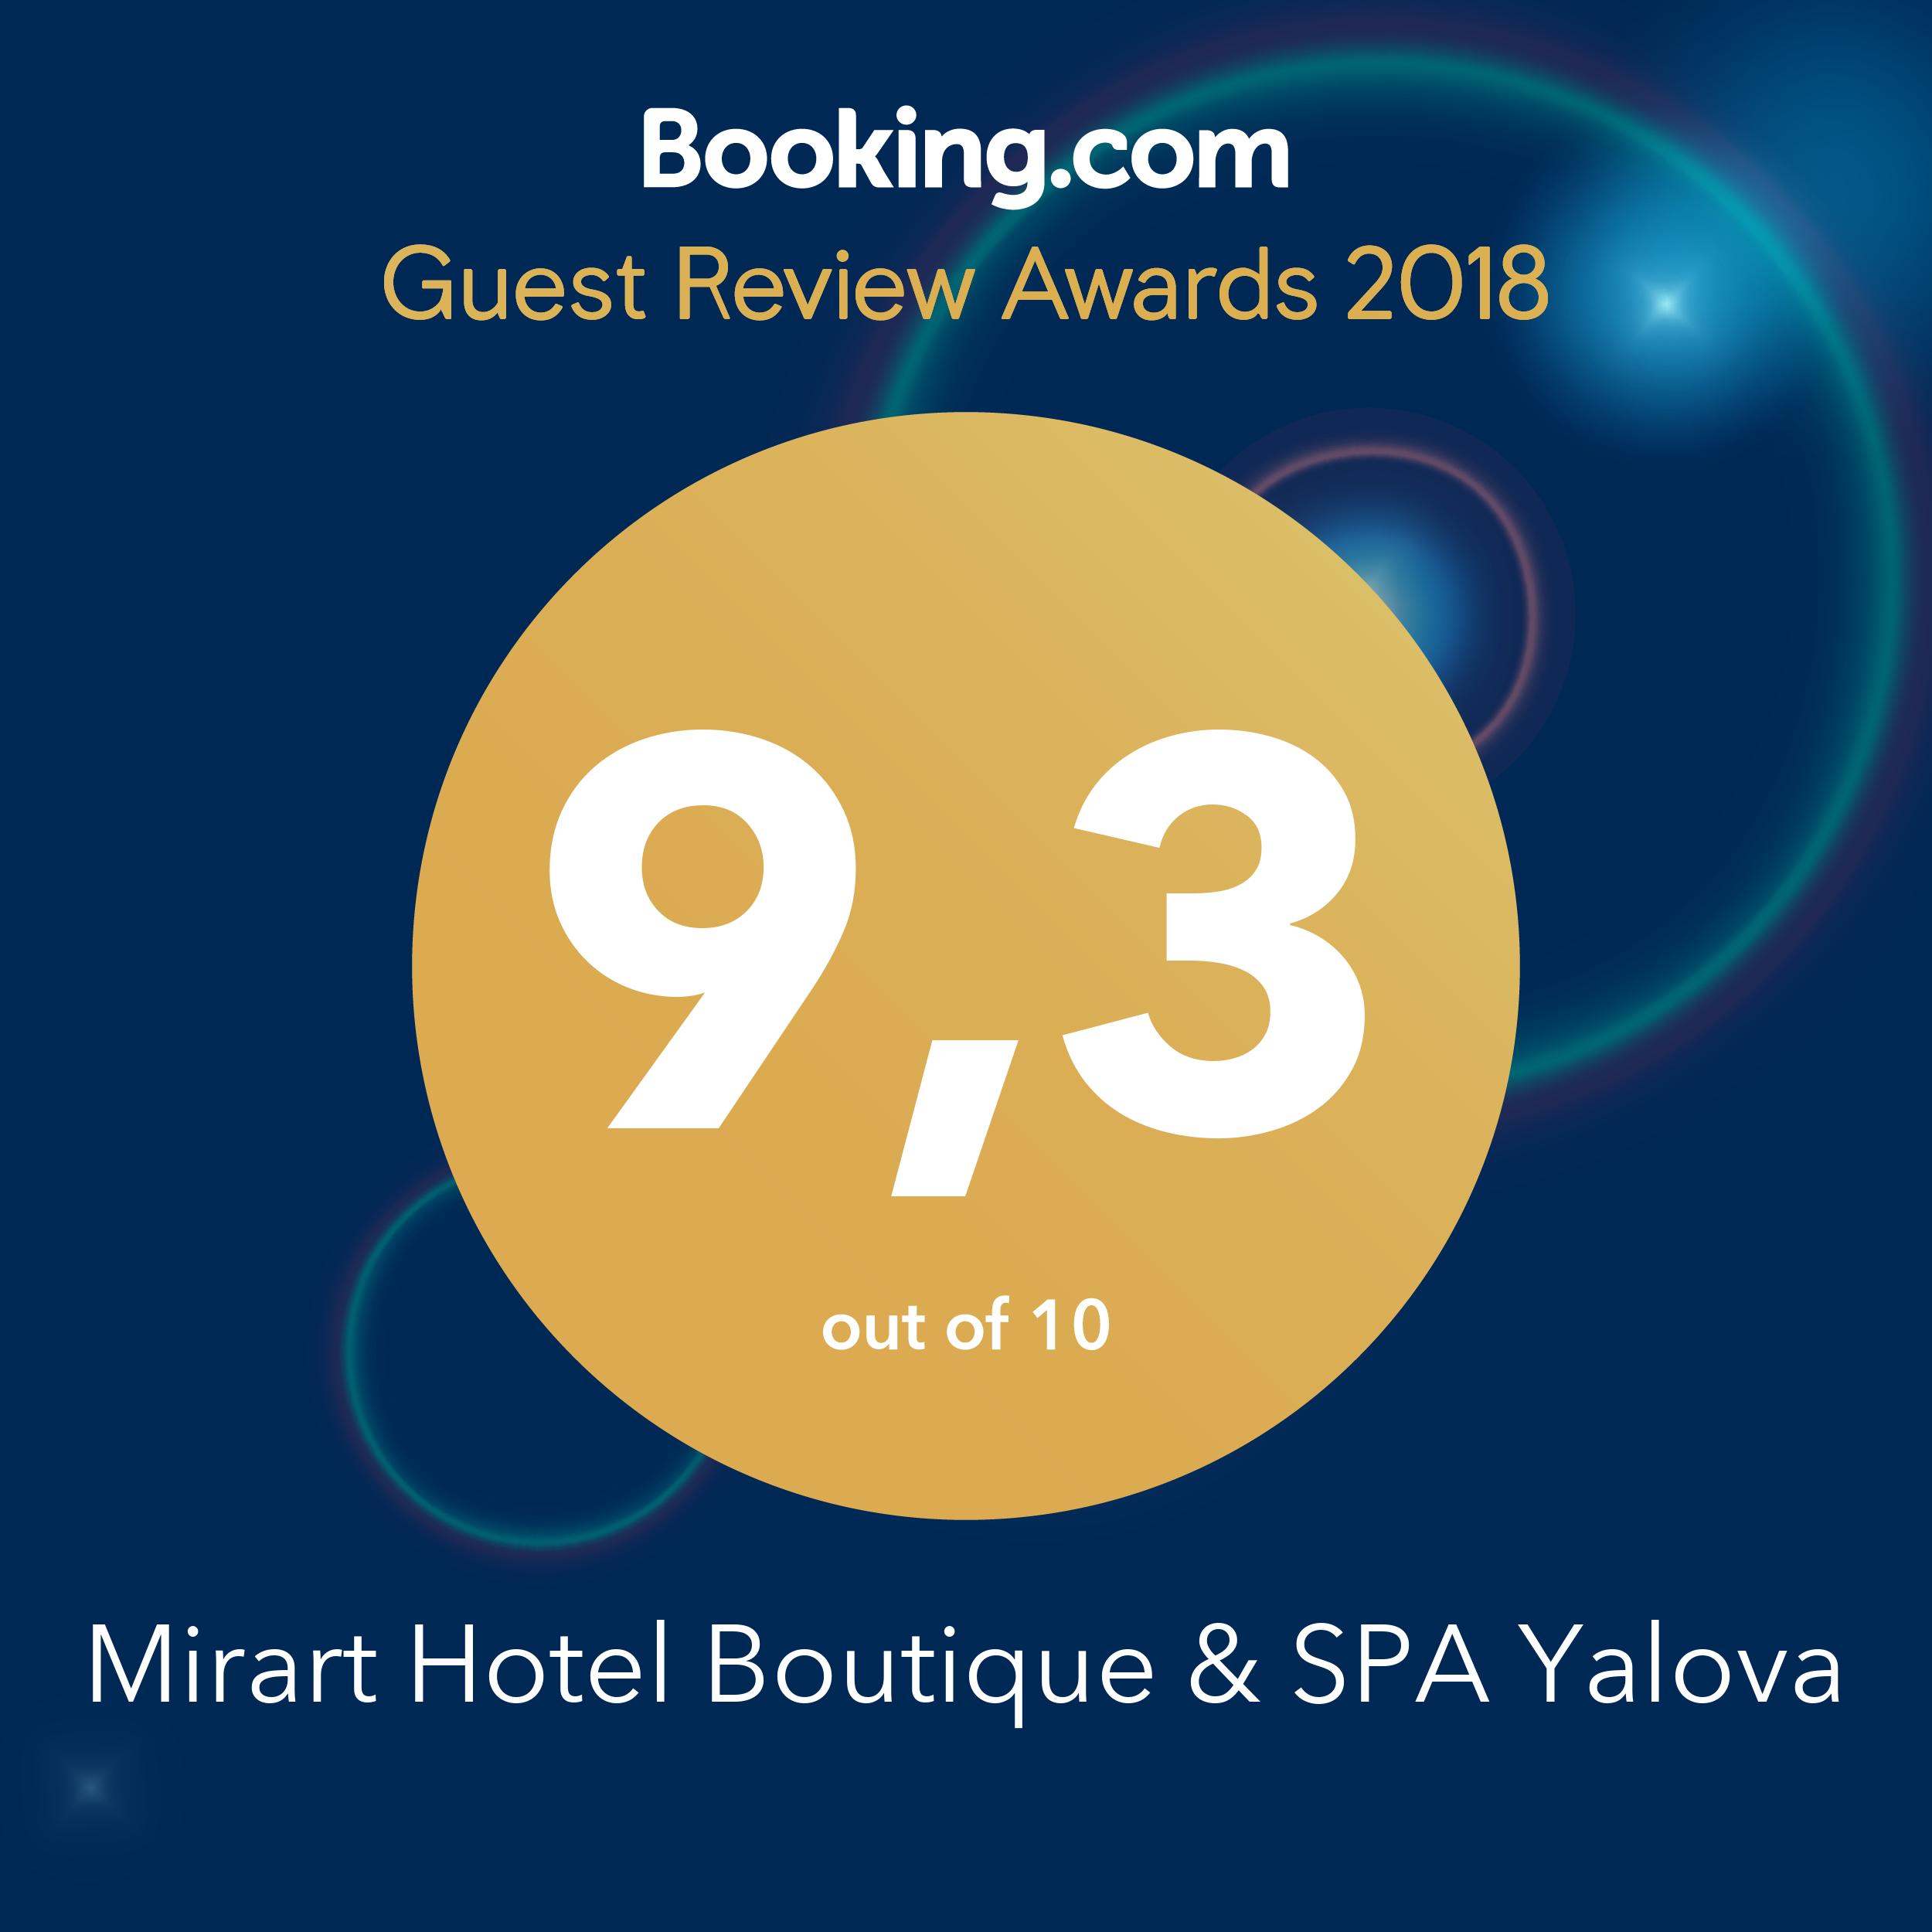 Mirart Hotel - bookingcom